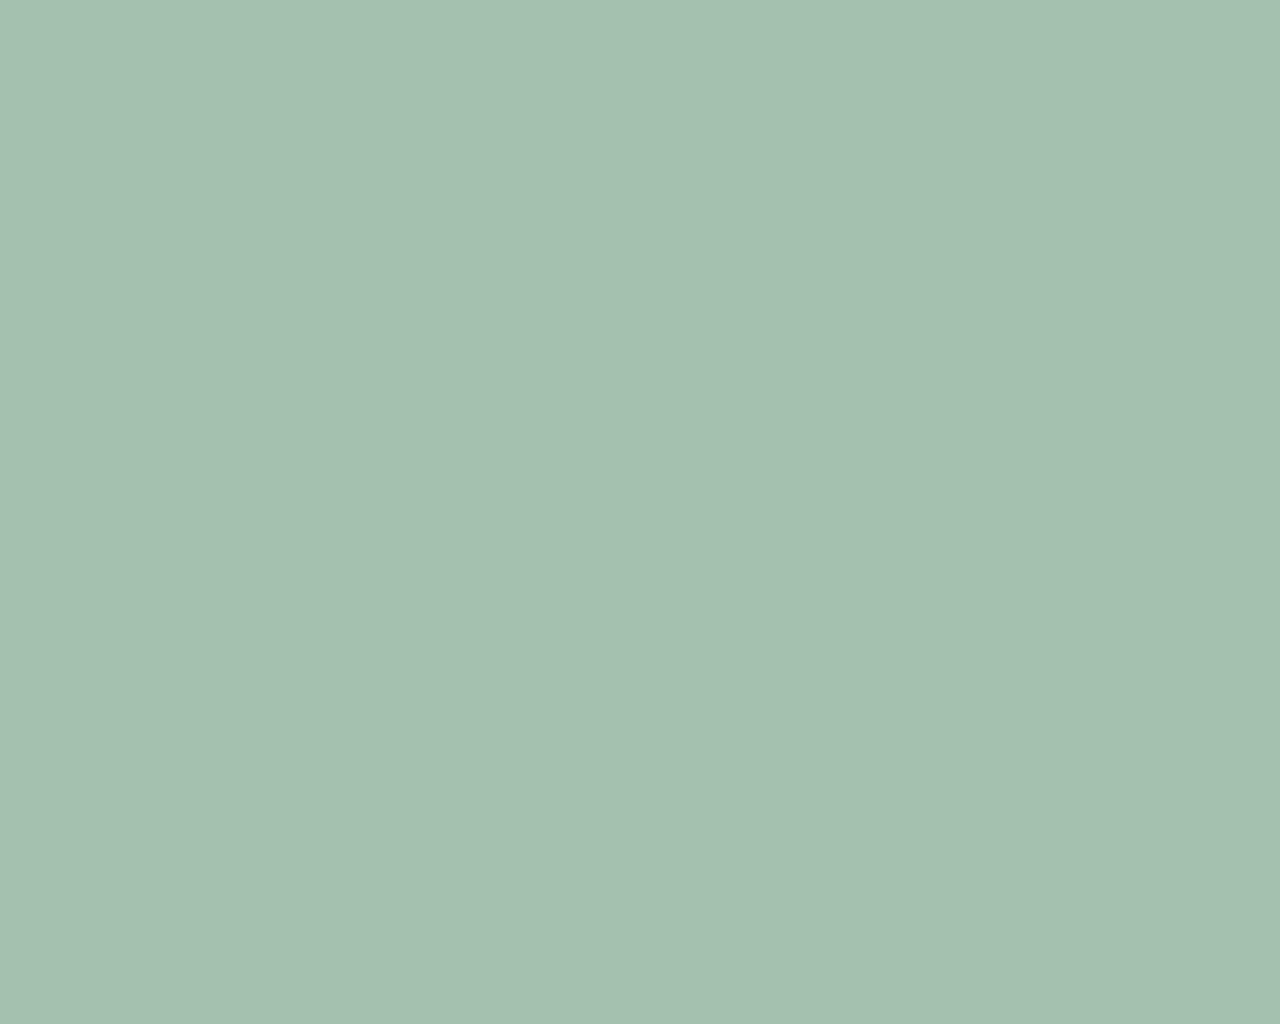 1280x1024 Cambridge Blue Solid Color Background